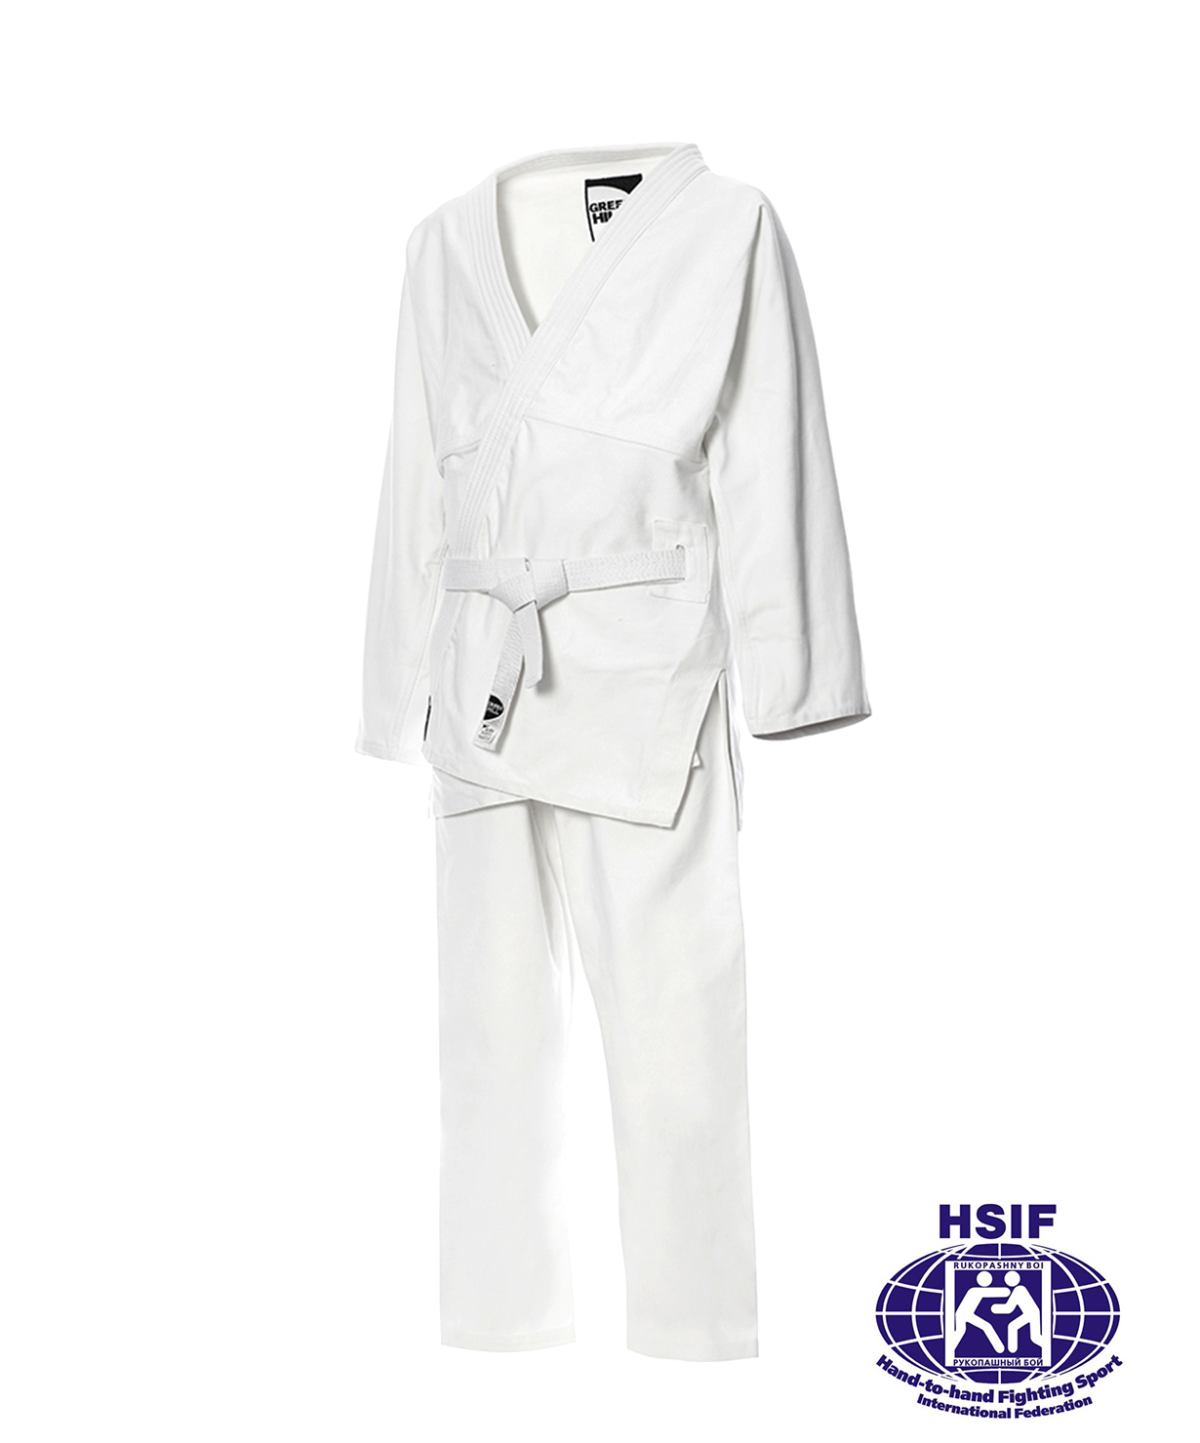 GREEN HILL Кимоно для рукопашного боя р.1/140 Junior  SHH-2210 - 1